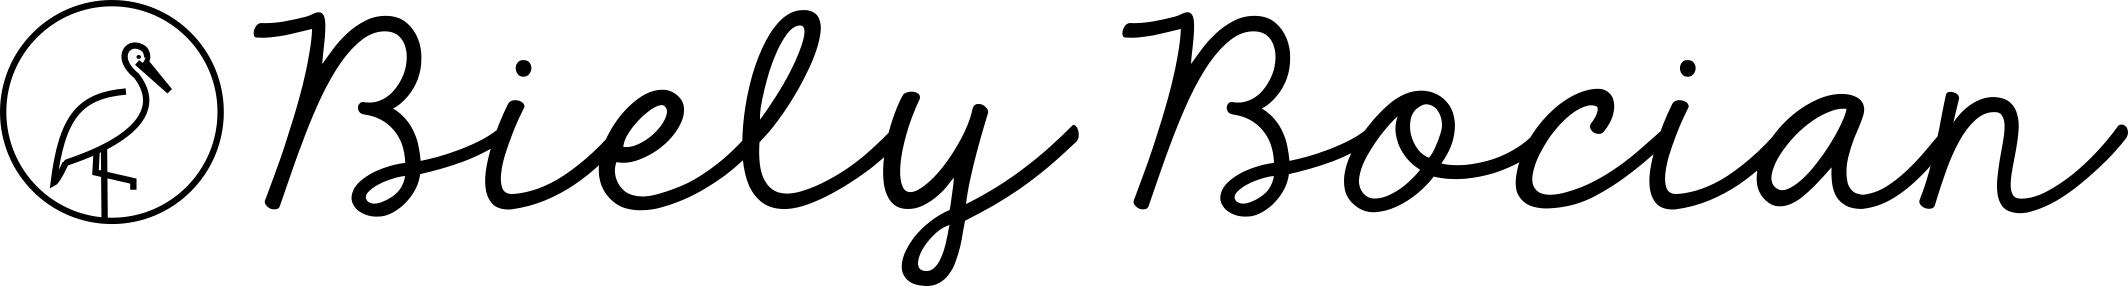 BIELYBOCIAN